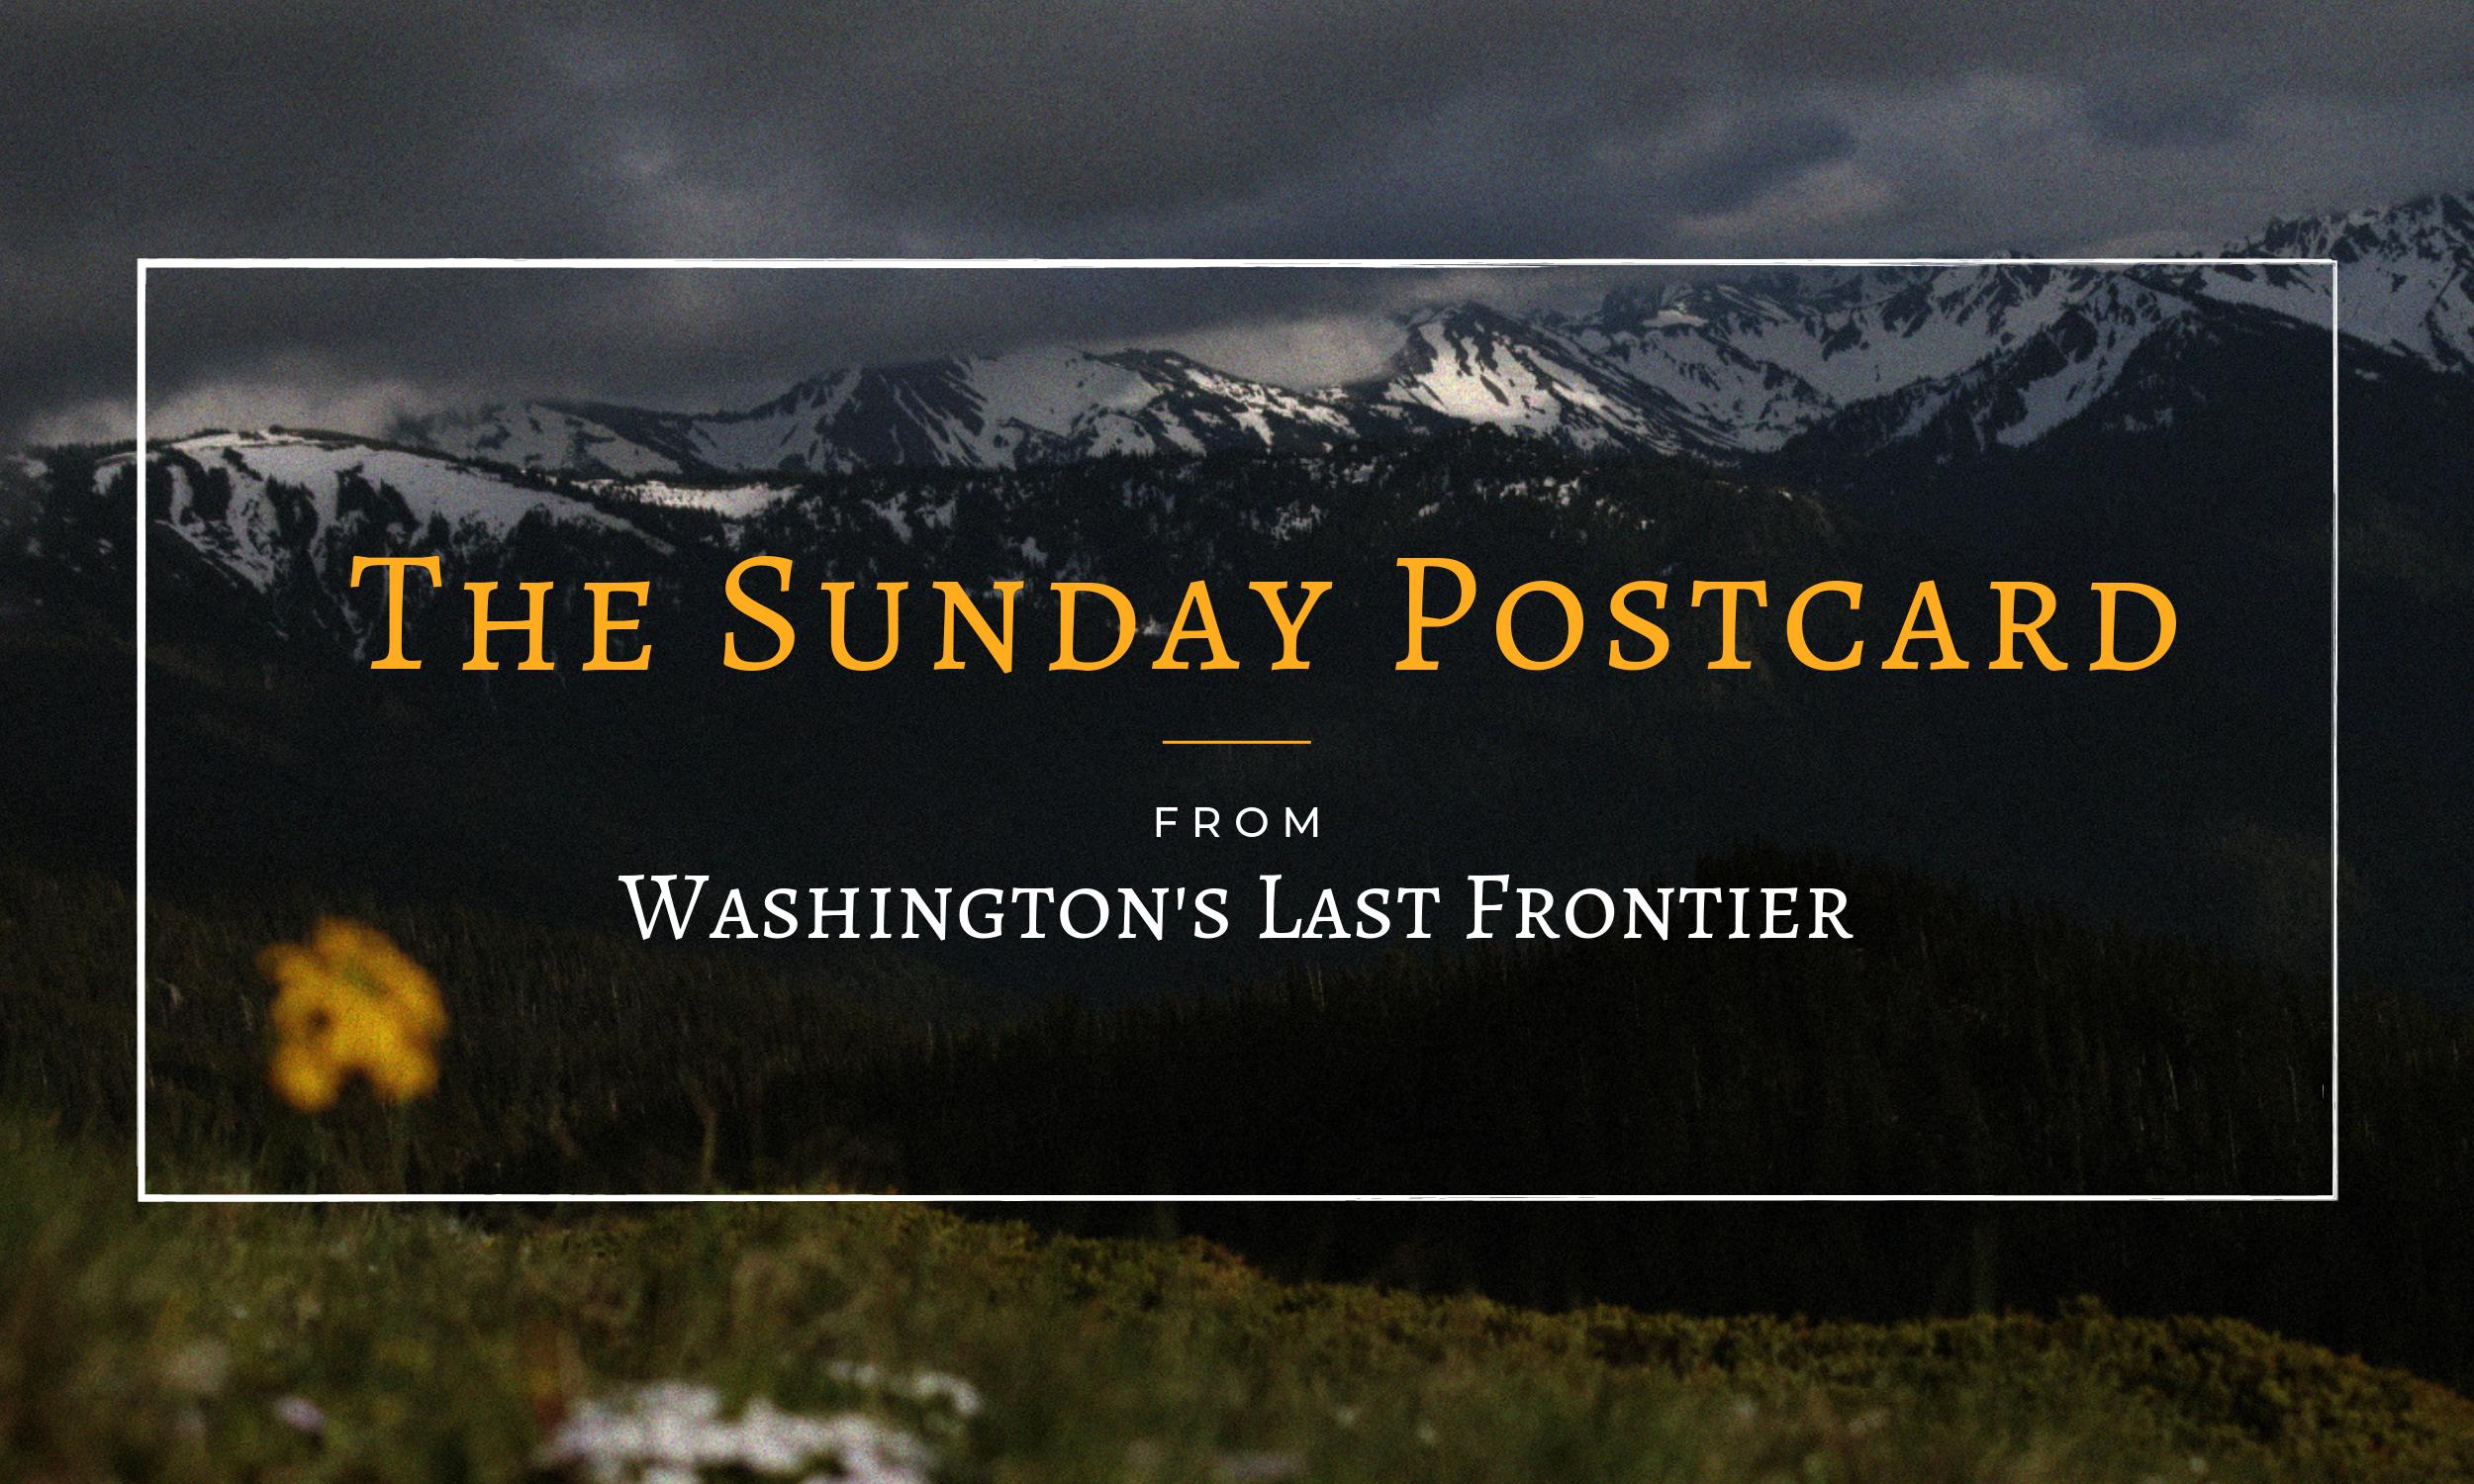 Washington's Last Frontier Sunday Postcard Email Newsletter For Homesteaders Wilderness Living Washington State Inspiration